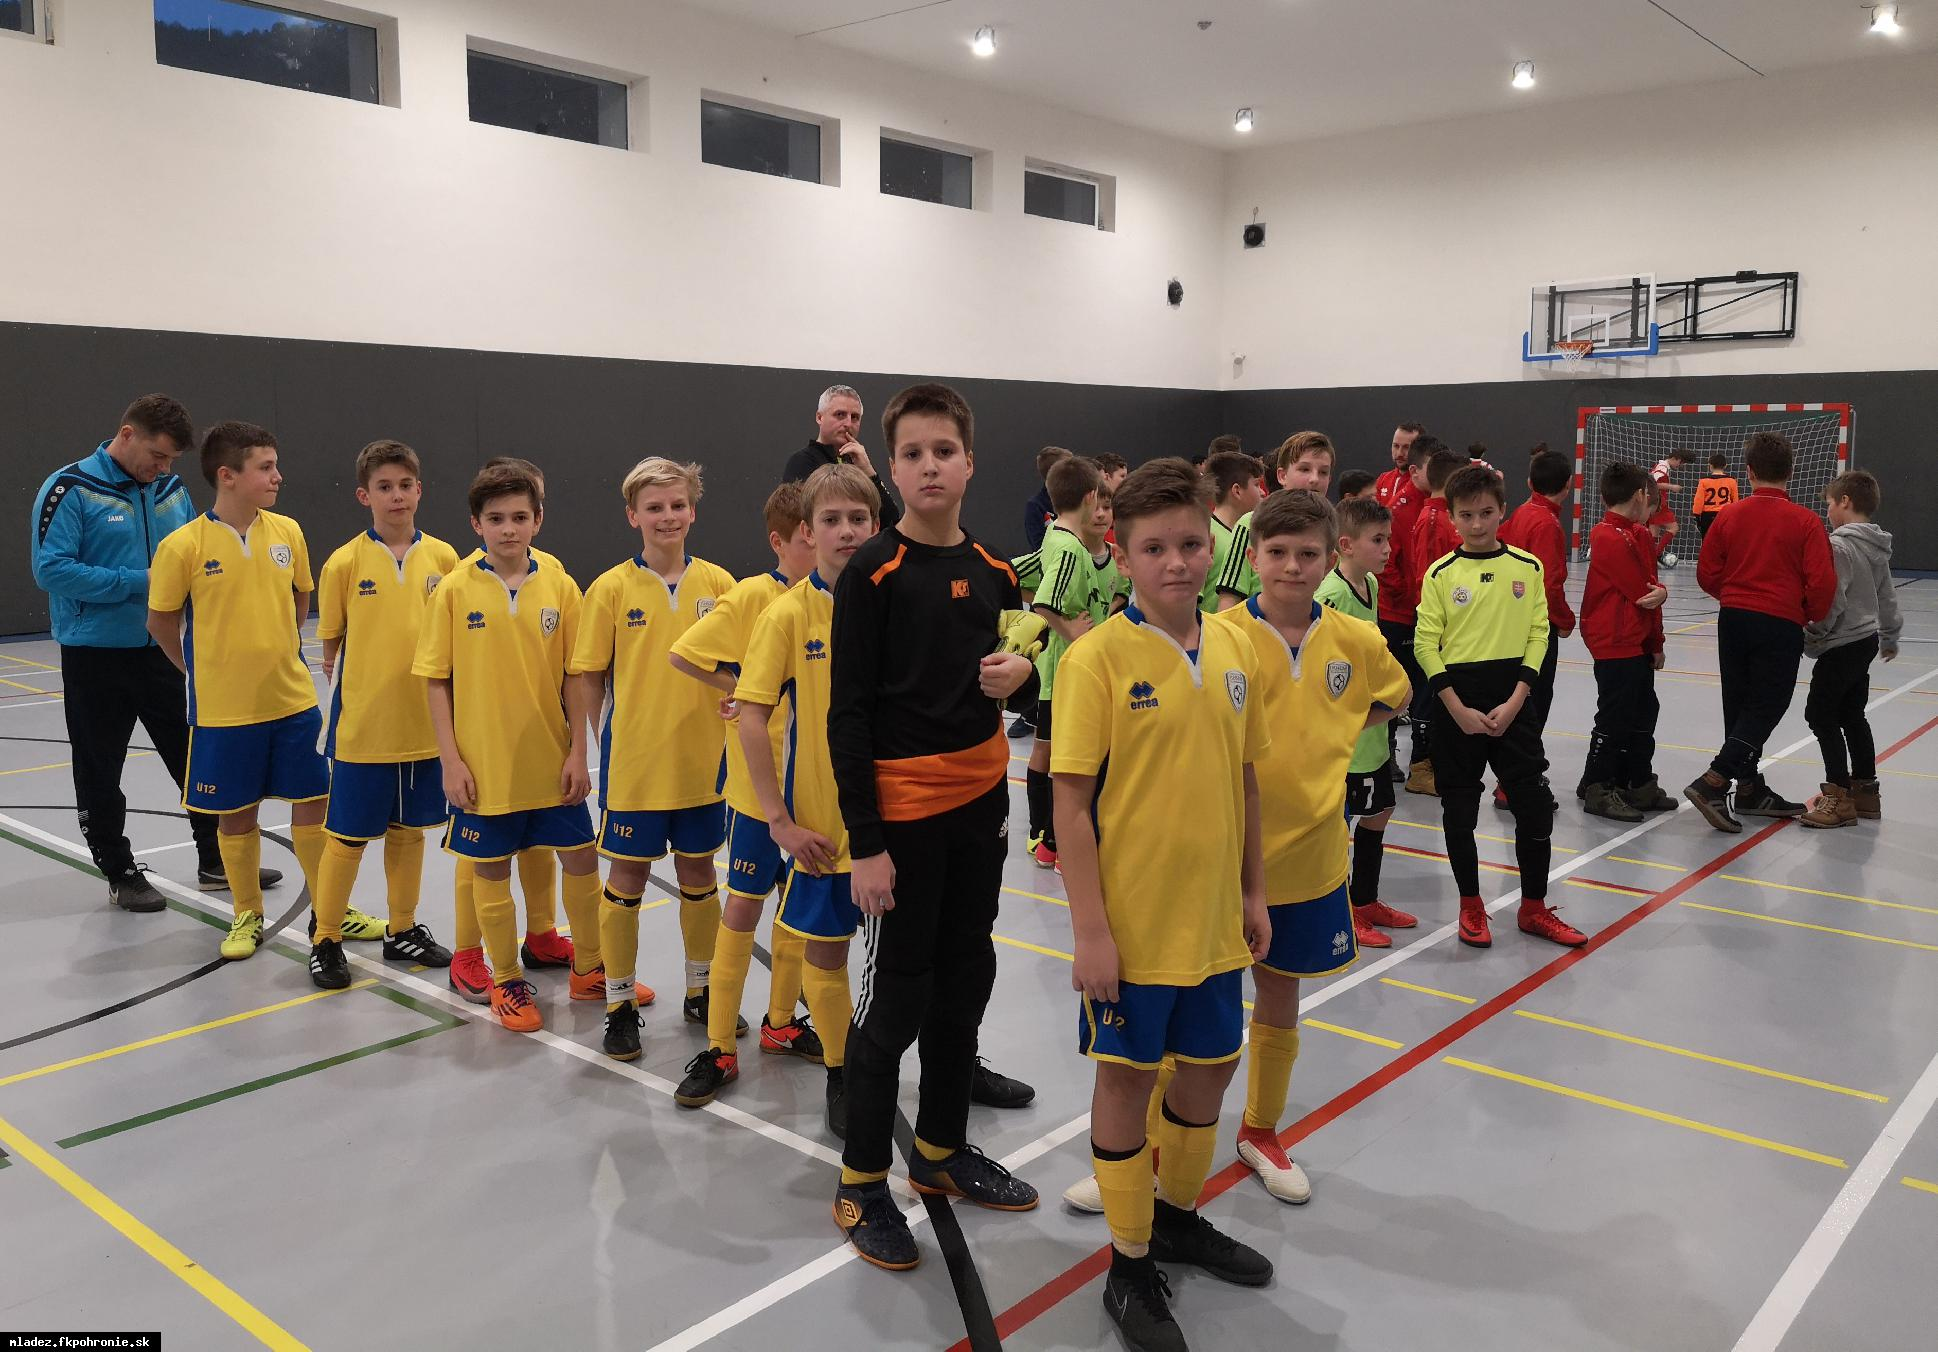 obr: U12: halový turnaj Fašiang Cup 2019 Kremnica 8.2.2019